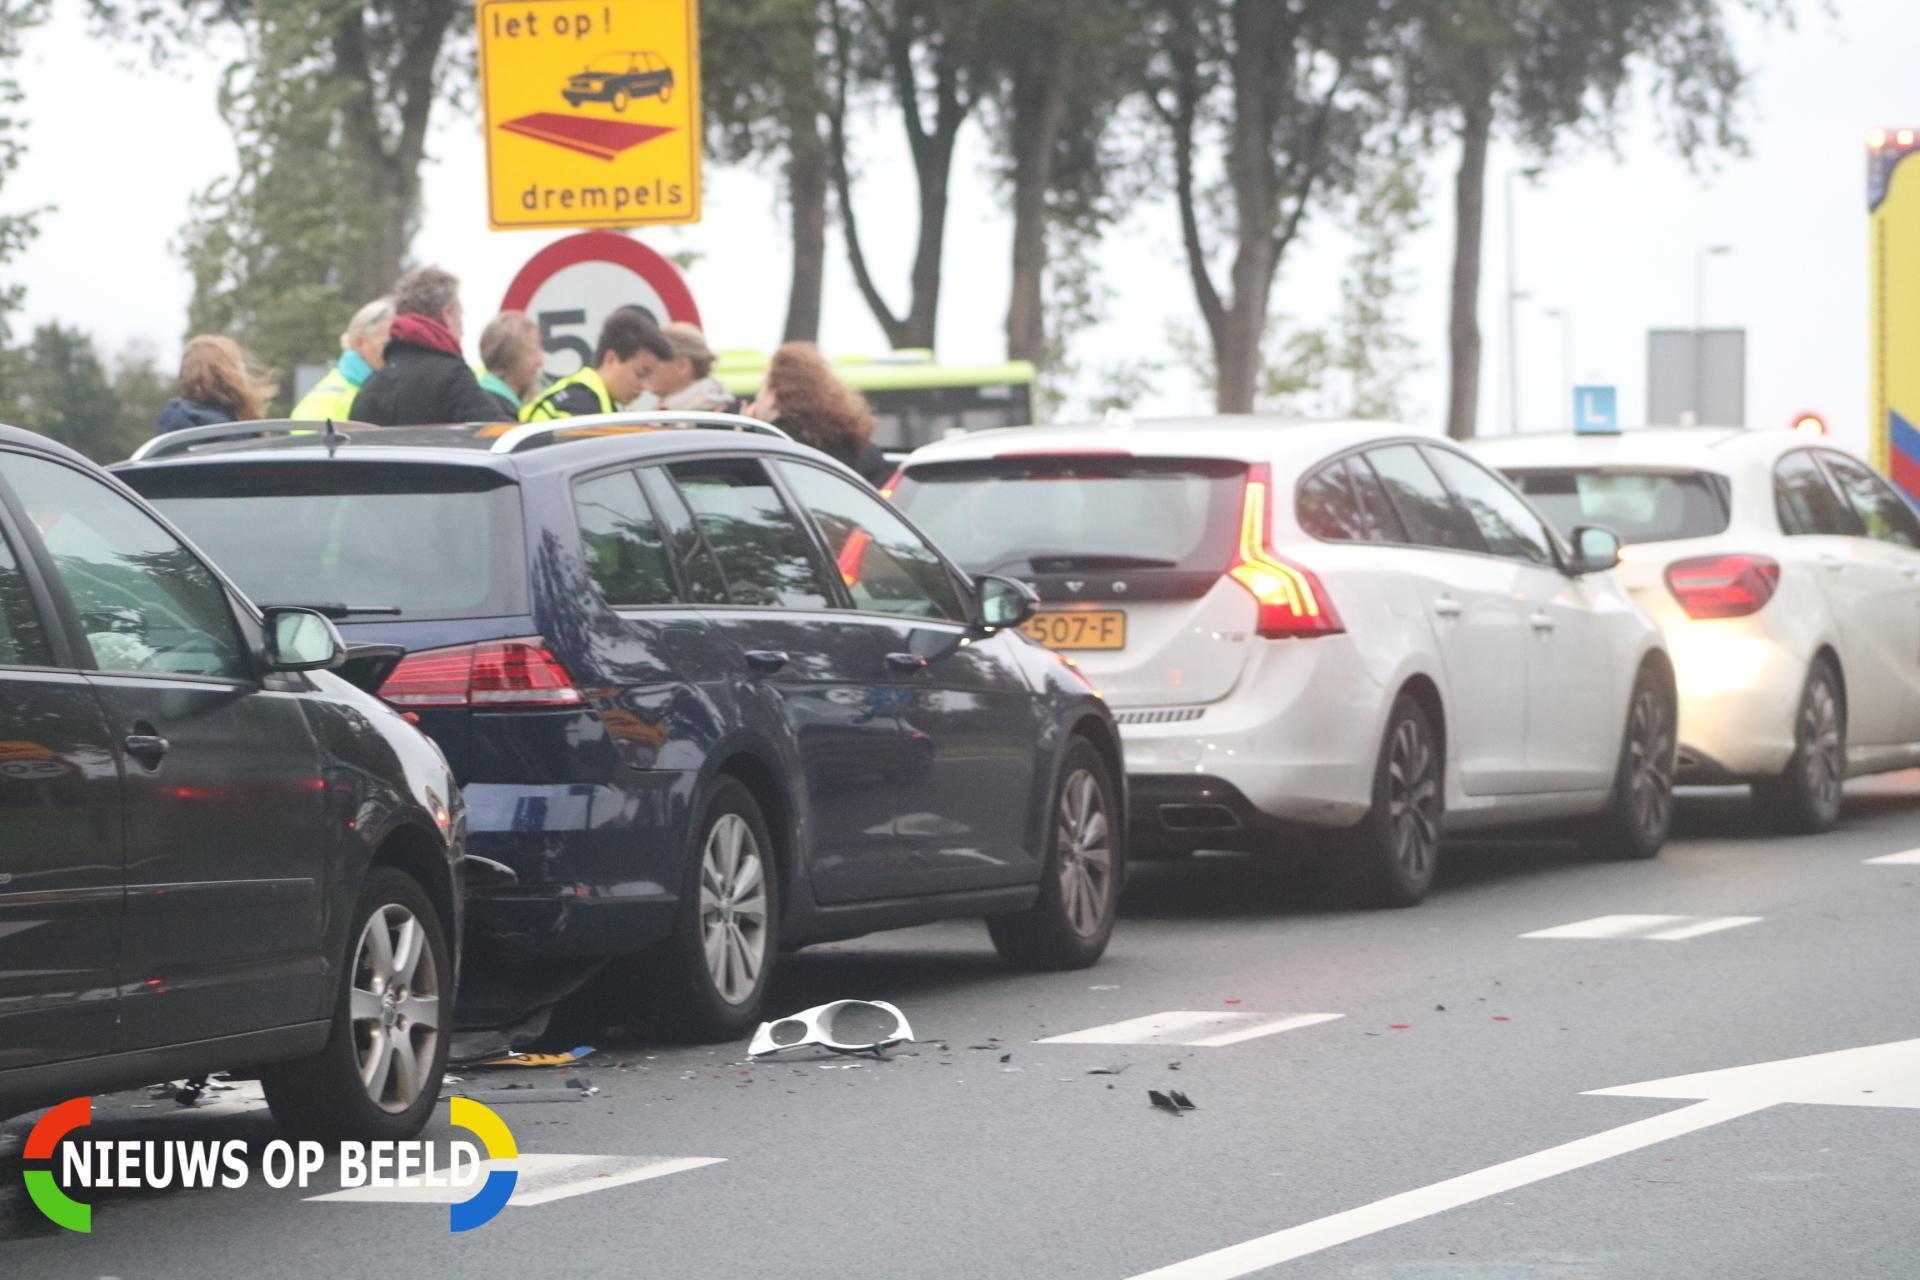 Twee gewonden na kettingbotsing met vier auto's Groene Kruisweg West – N218 Heenvliet